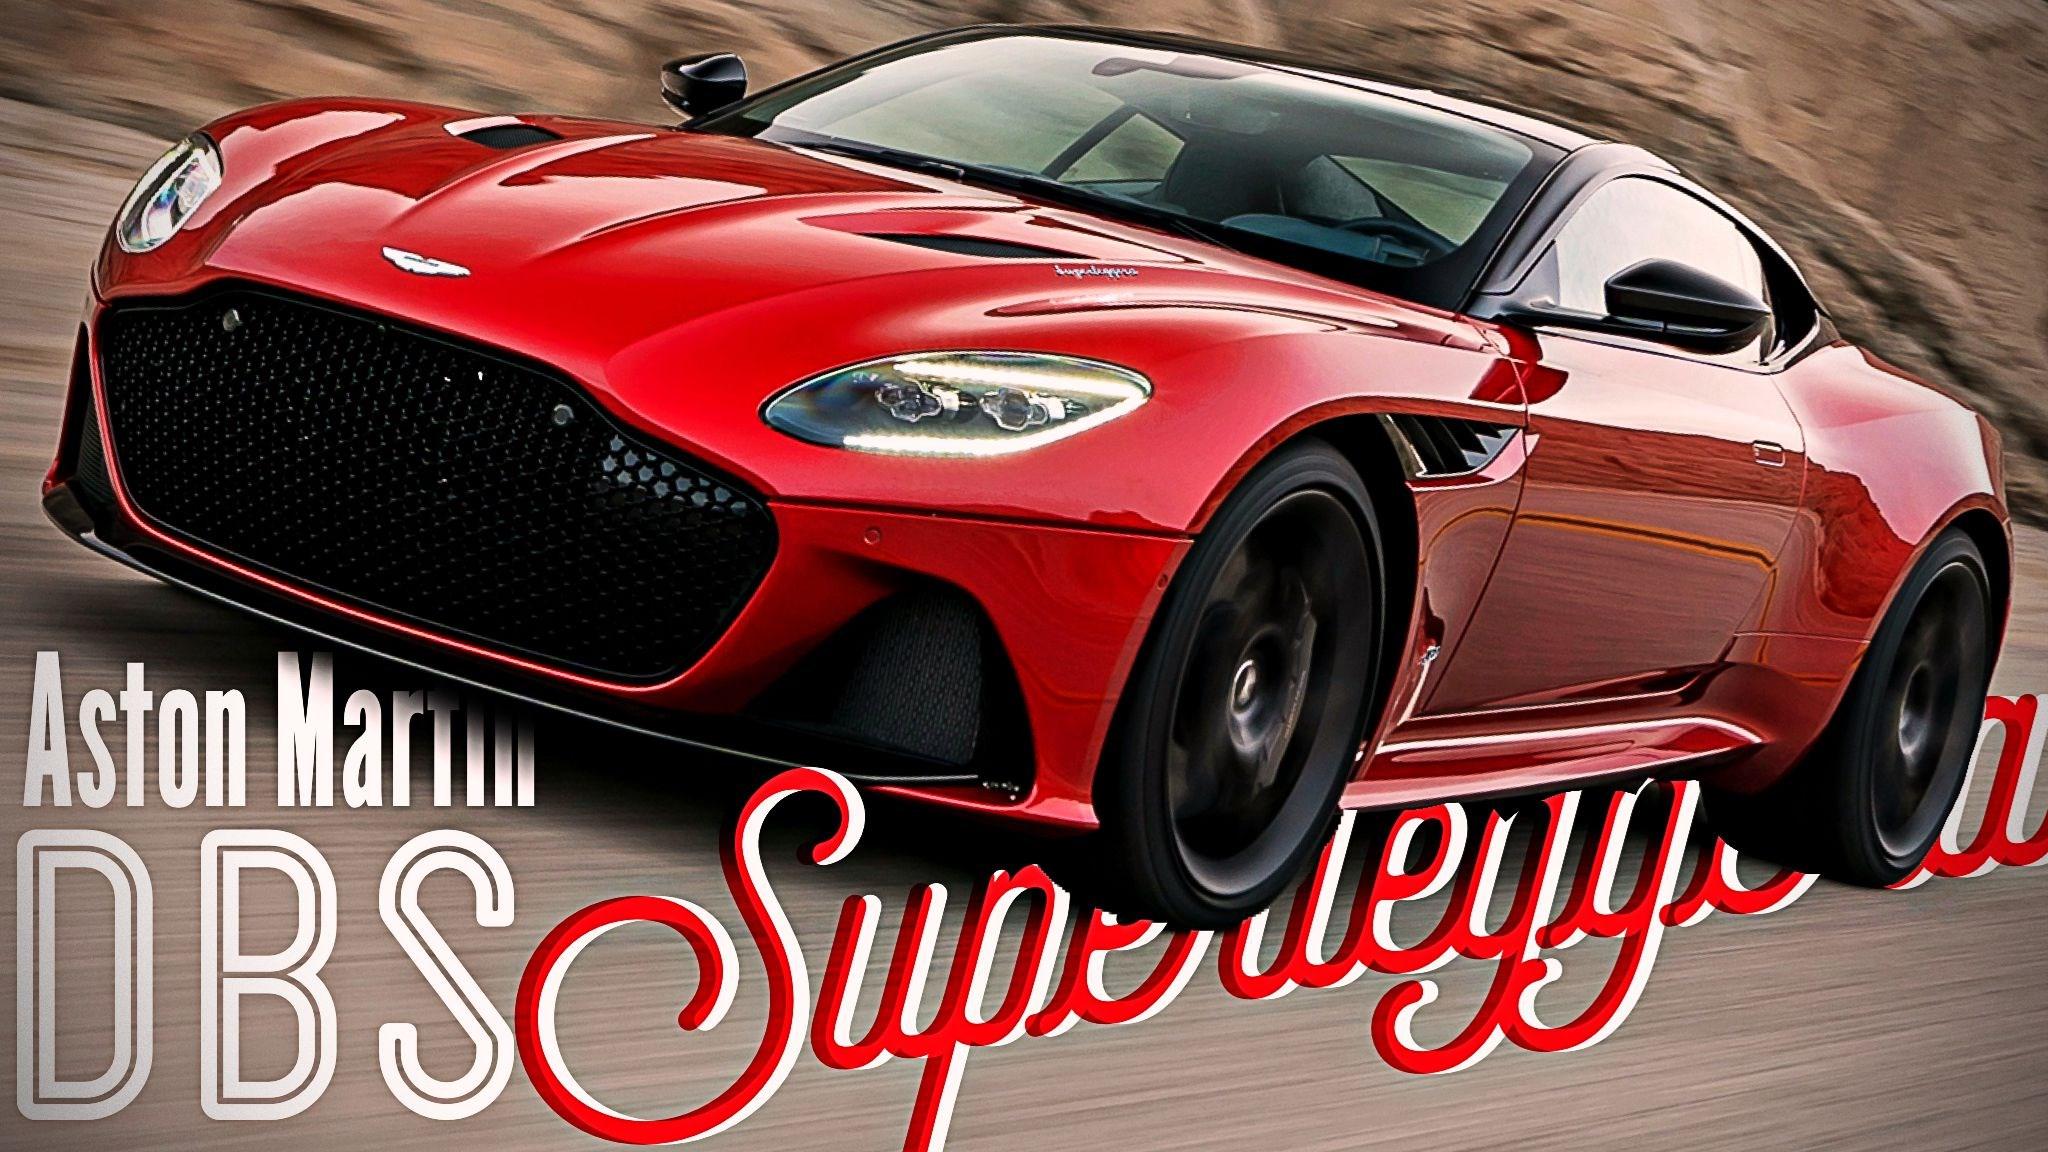 Aston Martin DBS Superleggera Is Both Beauty And Beast